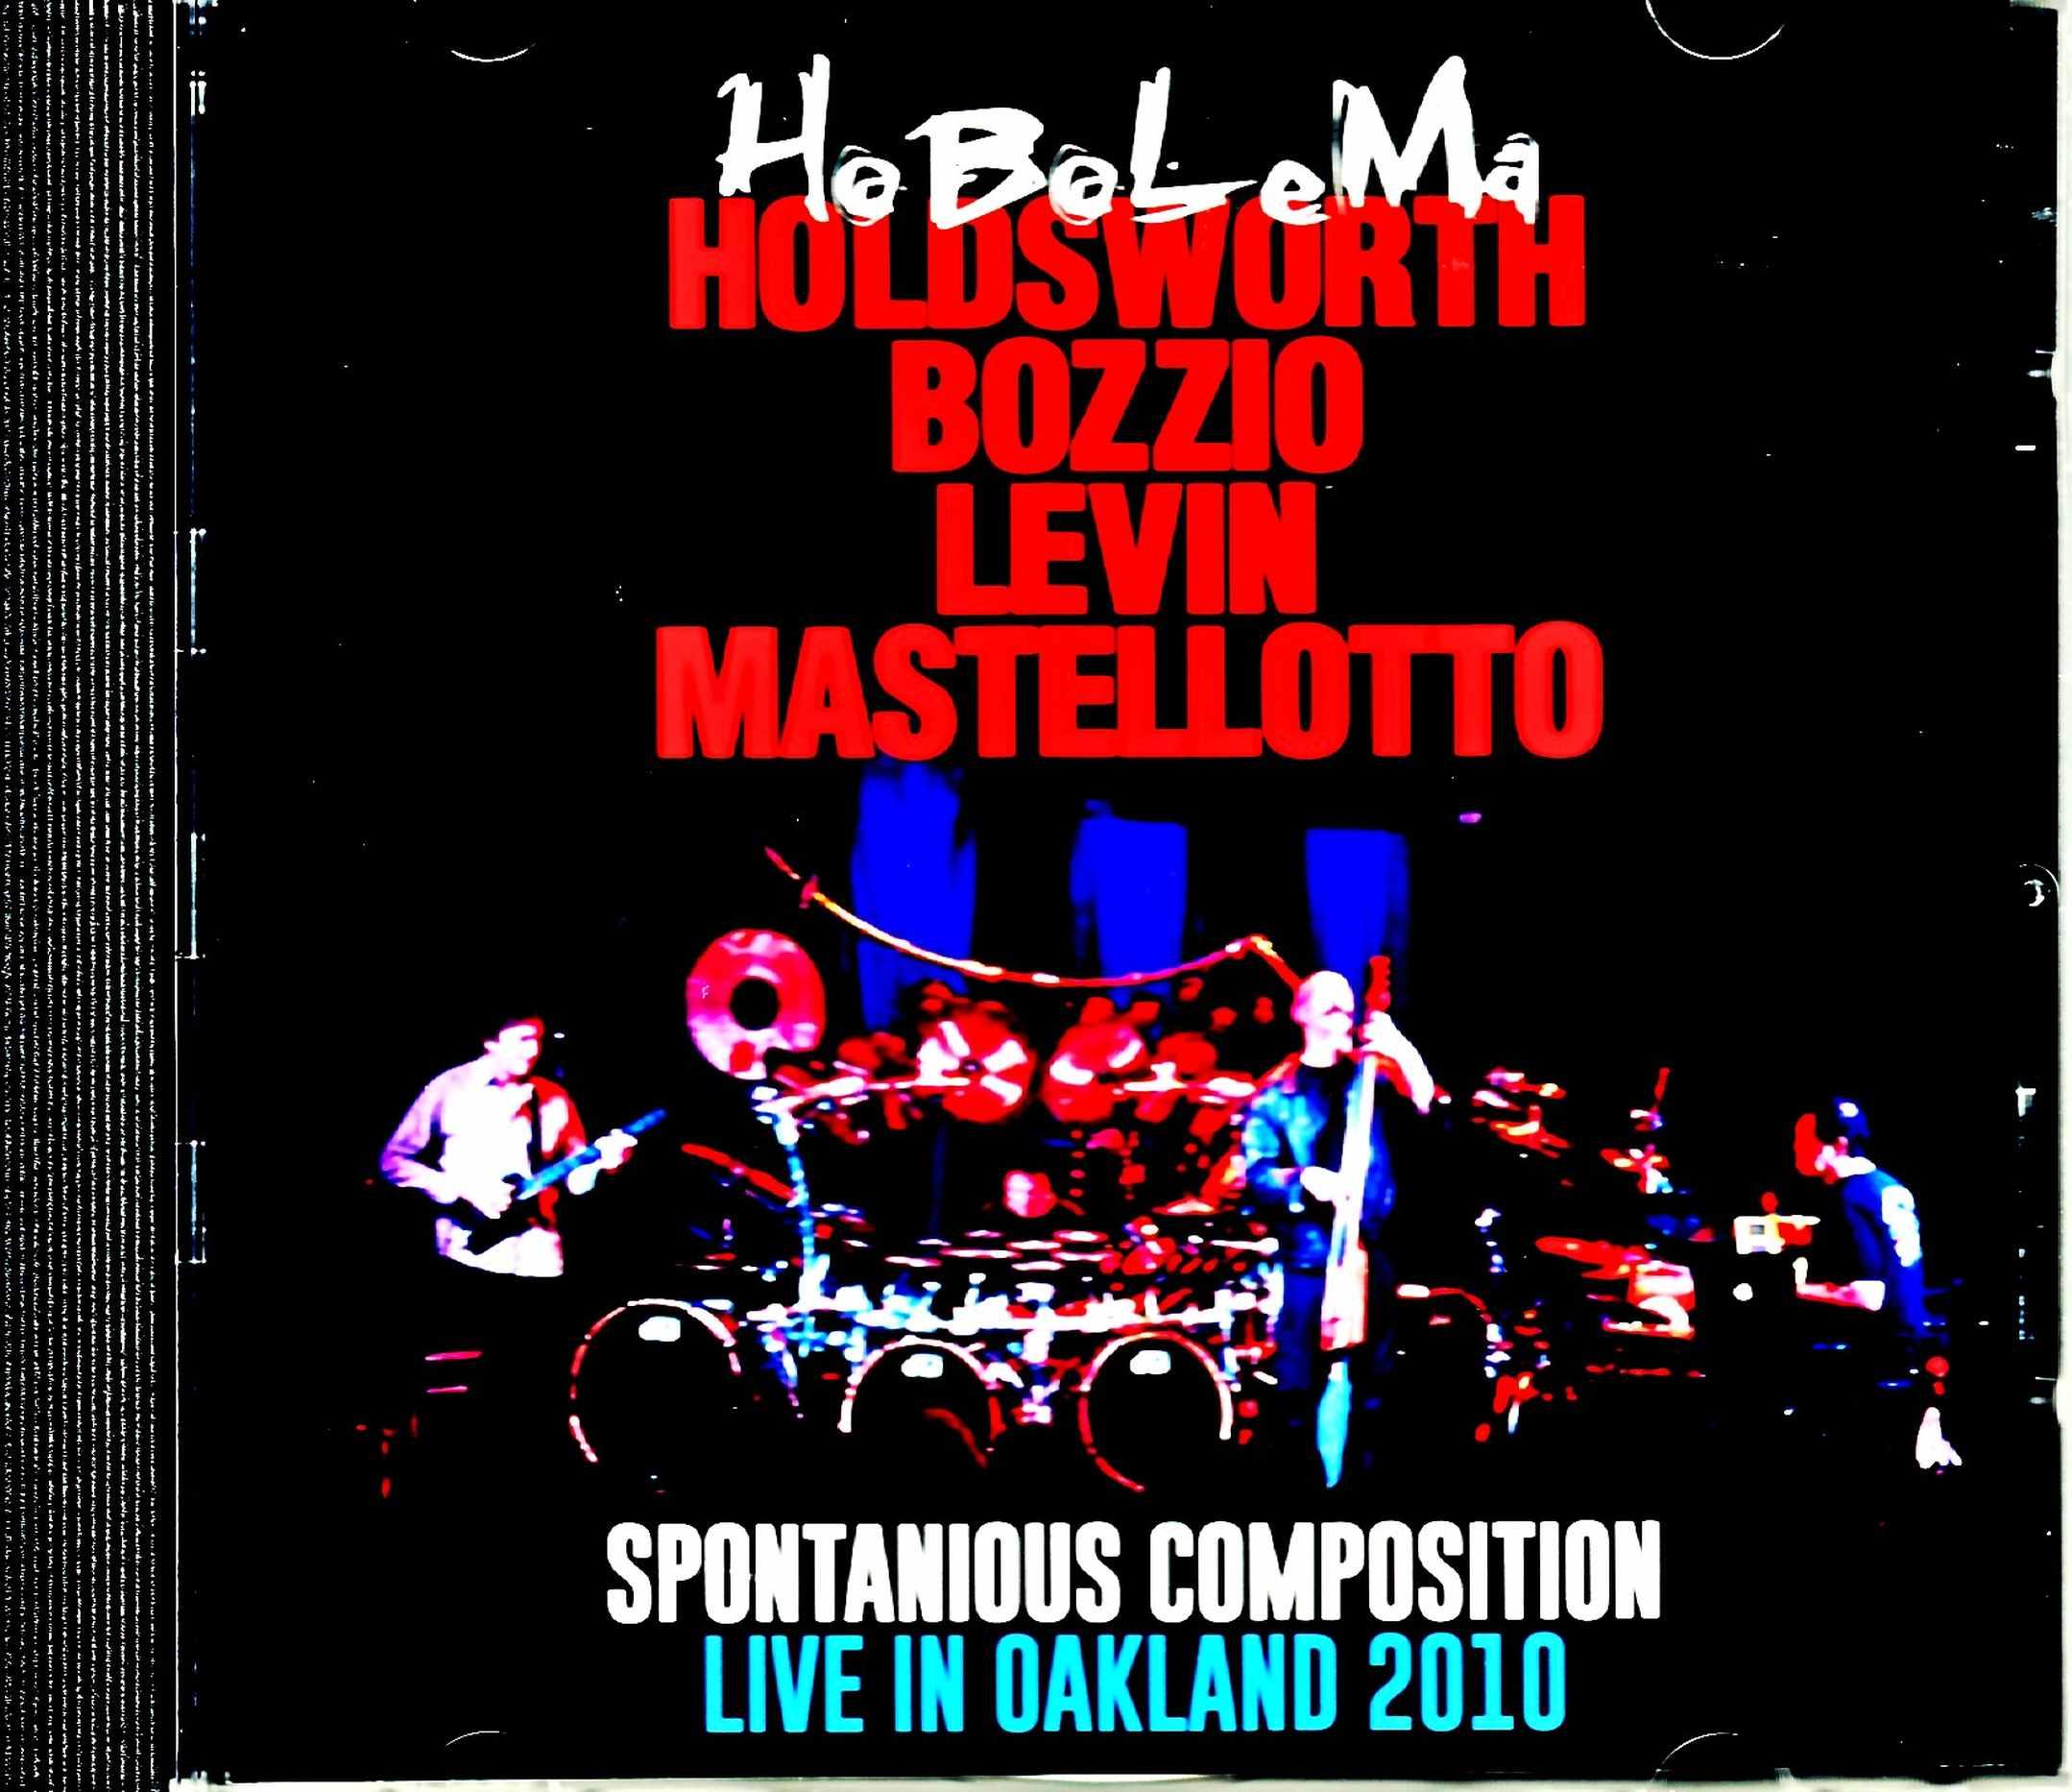 HoBoLaMa Holdsworth,Bozzio,Levin,Mastellotto ホボラマ/CA,USA 2010